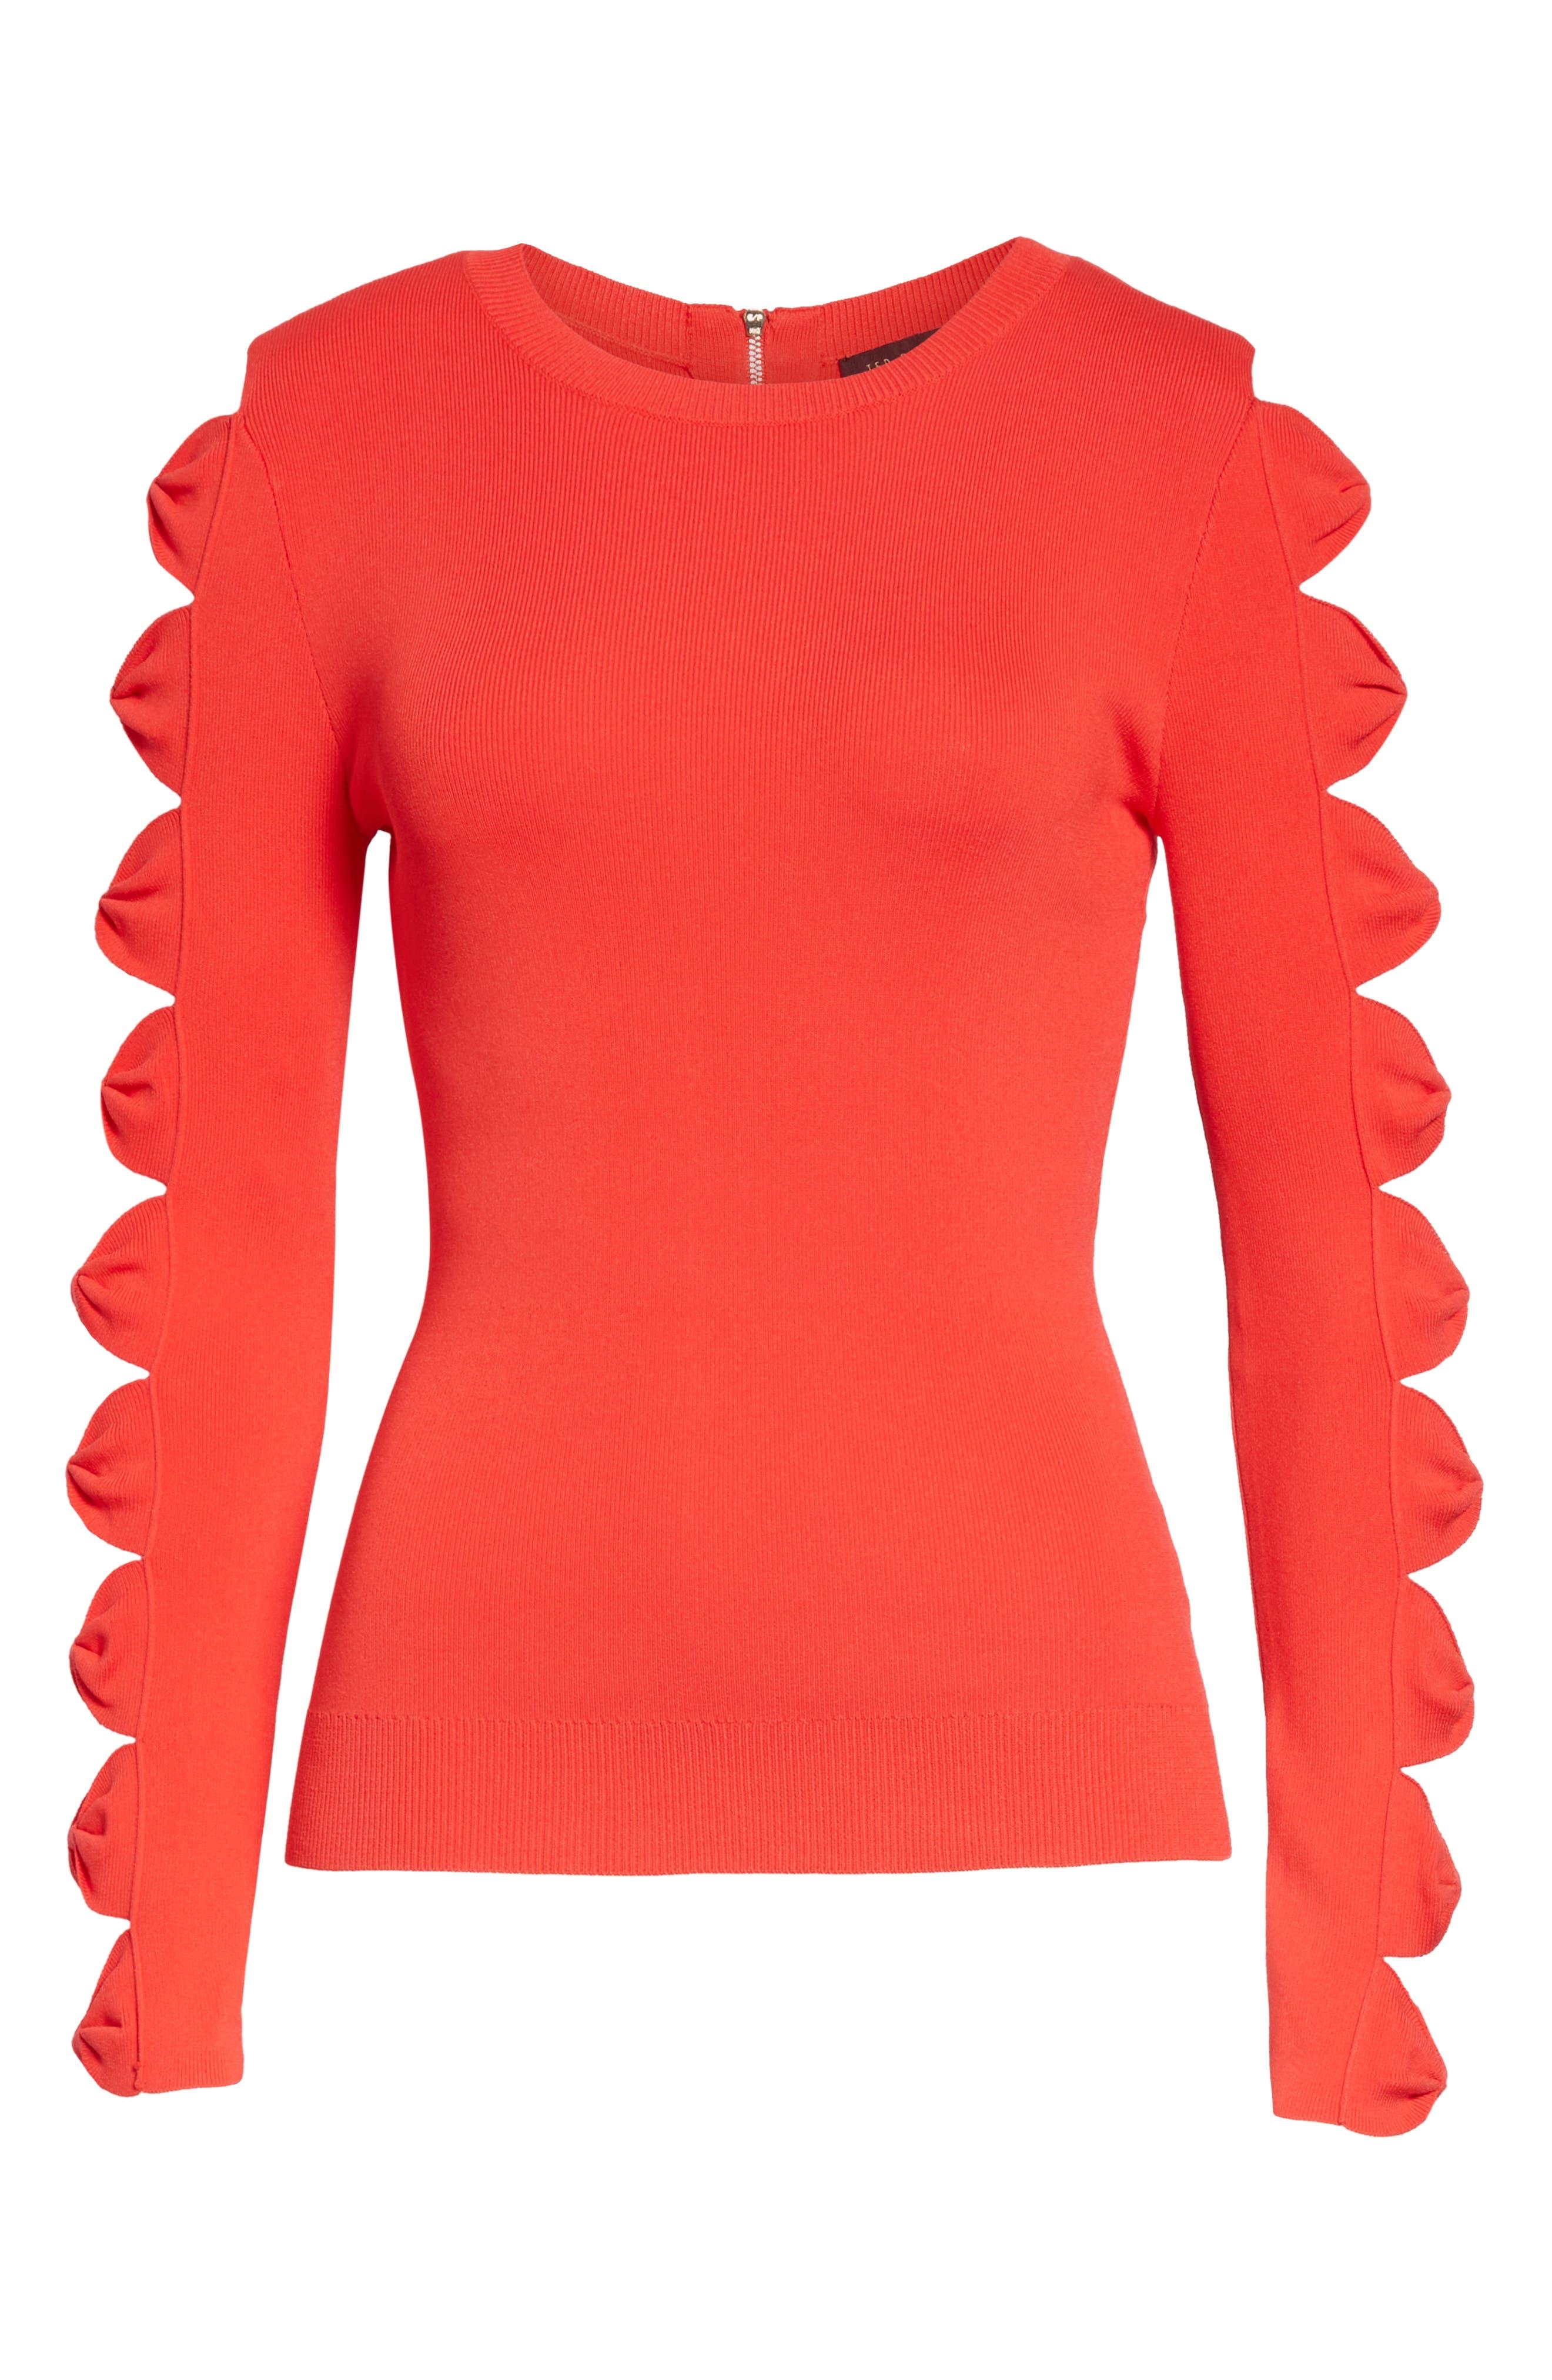 Yonoh Cutout Sleeve Sweater,                             Alternate thumbnail 6, color,                             600